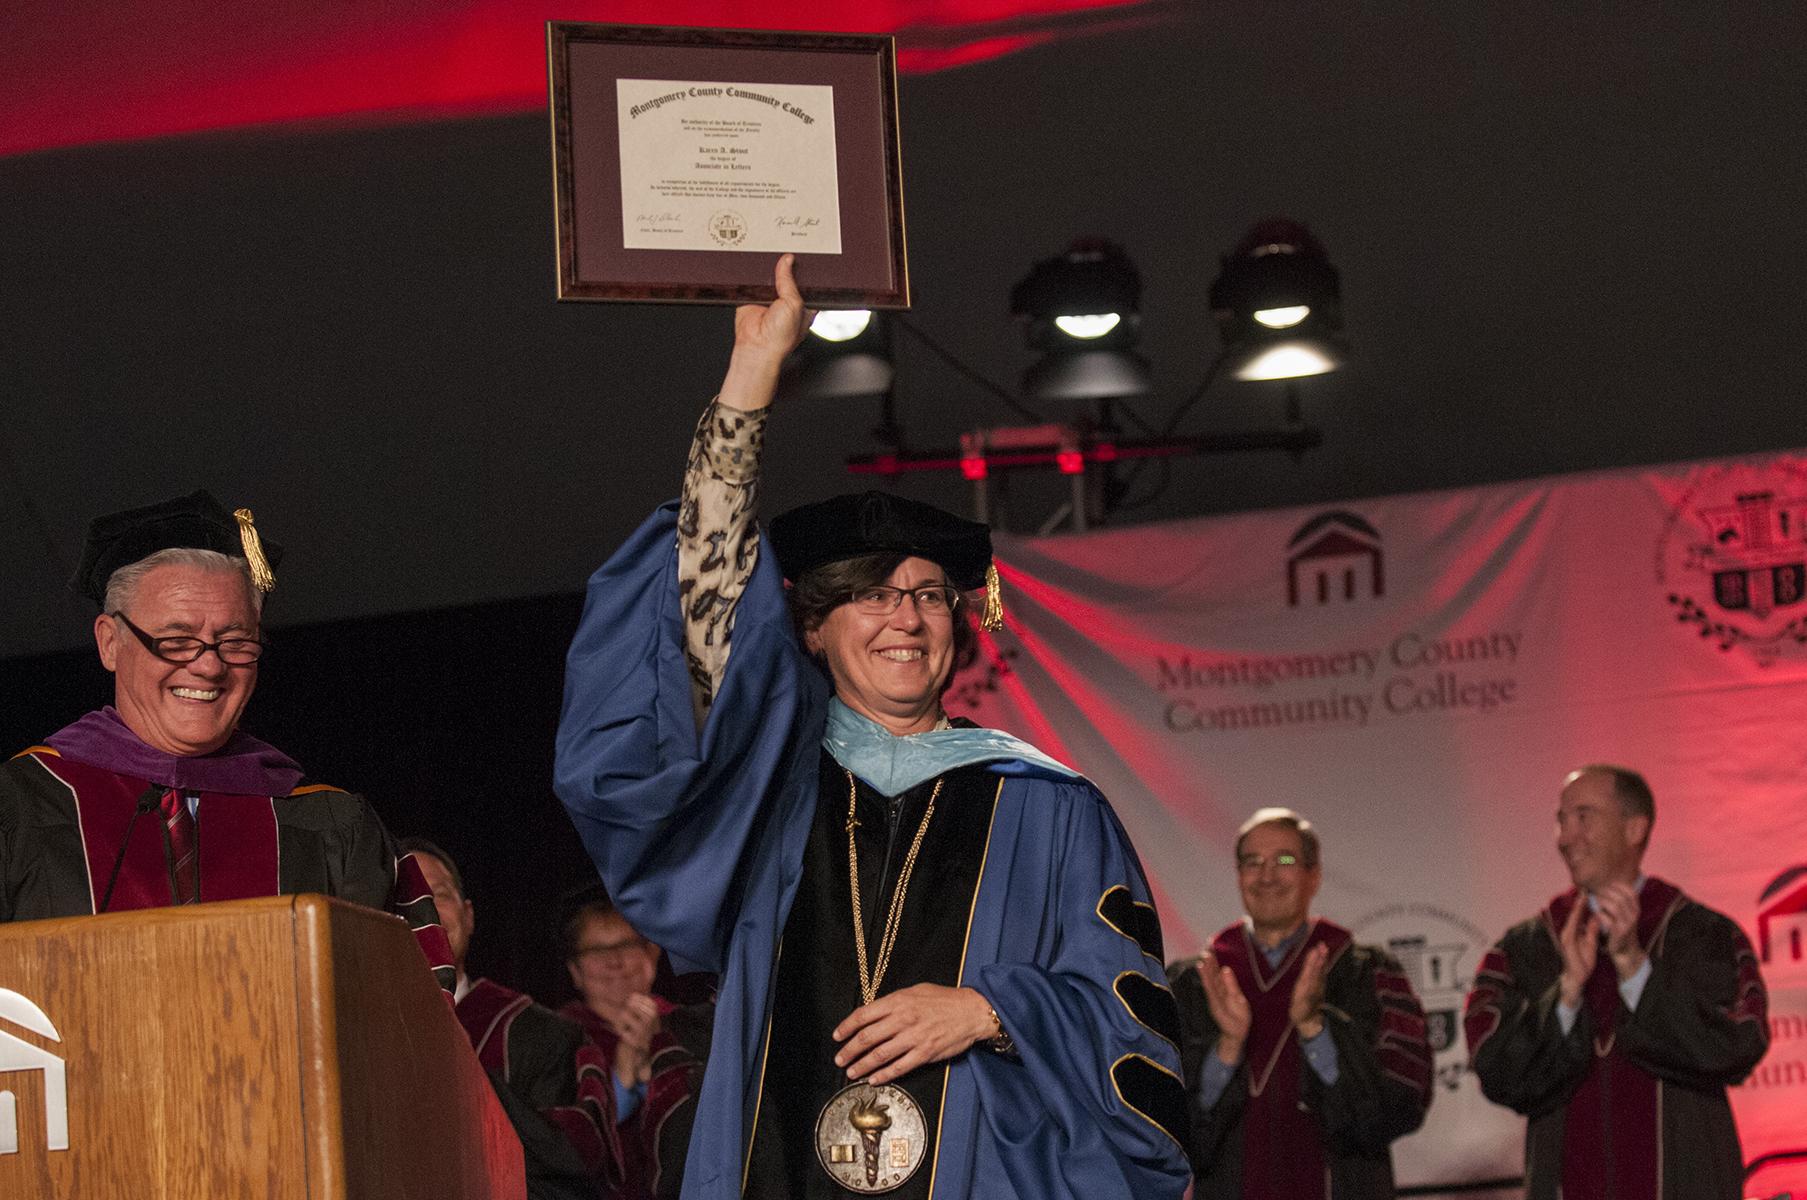 Legacy Honorary Degree